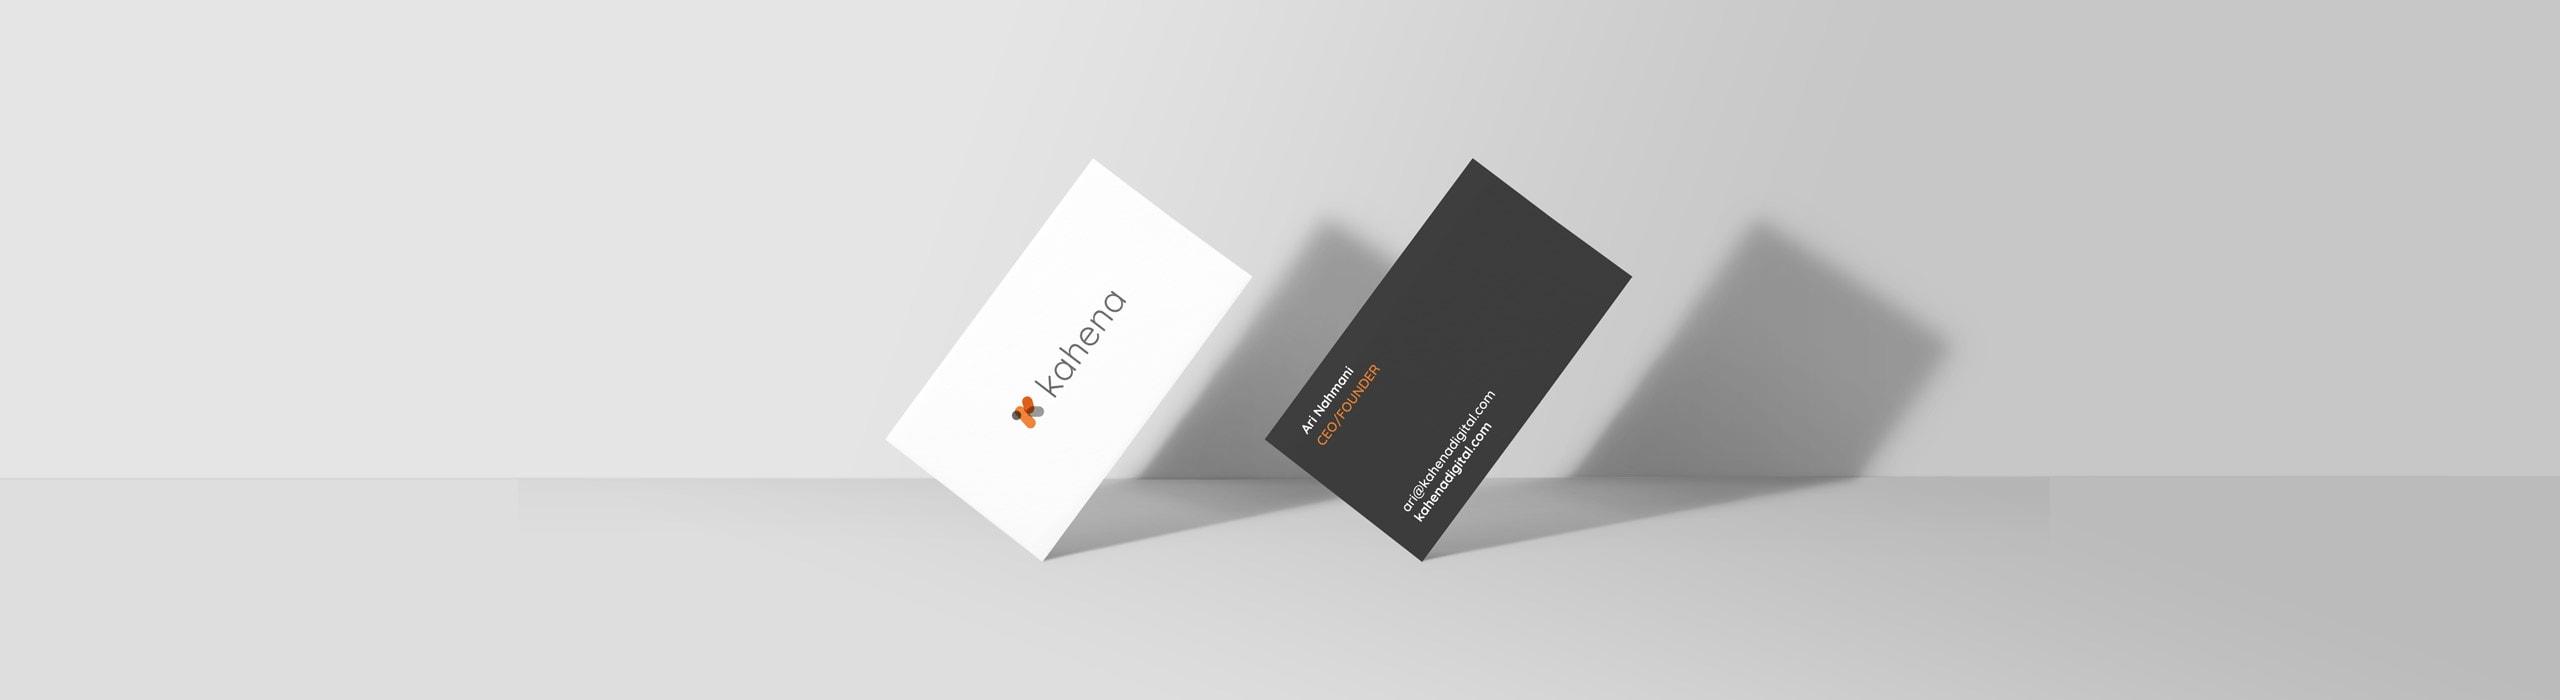 Kahena - natie-kahena-business-card - Natie Branding Agency